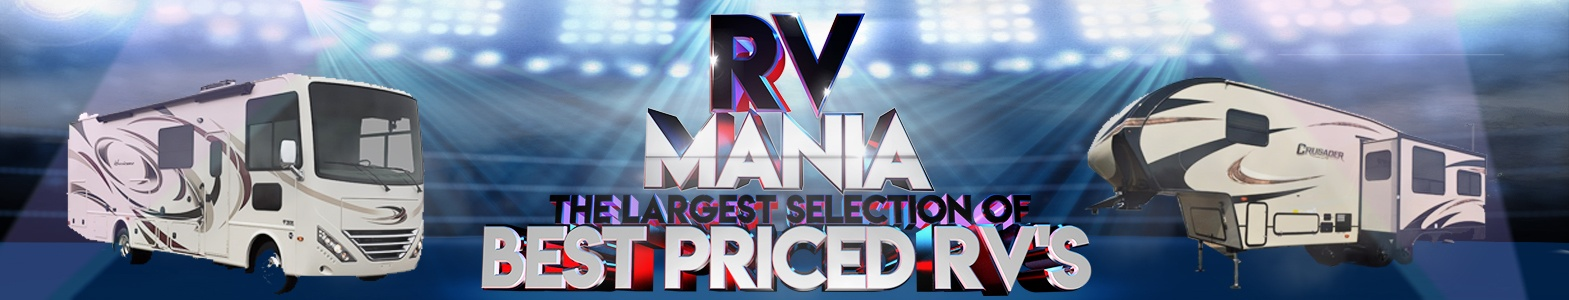 RVMania2017-2.jpg